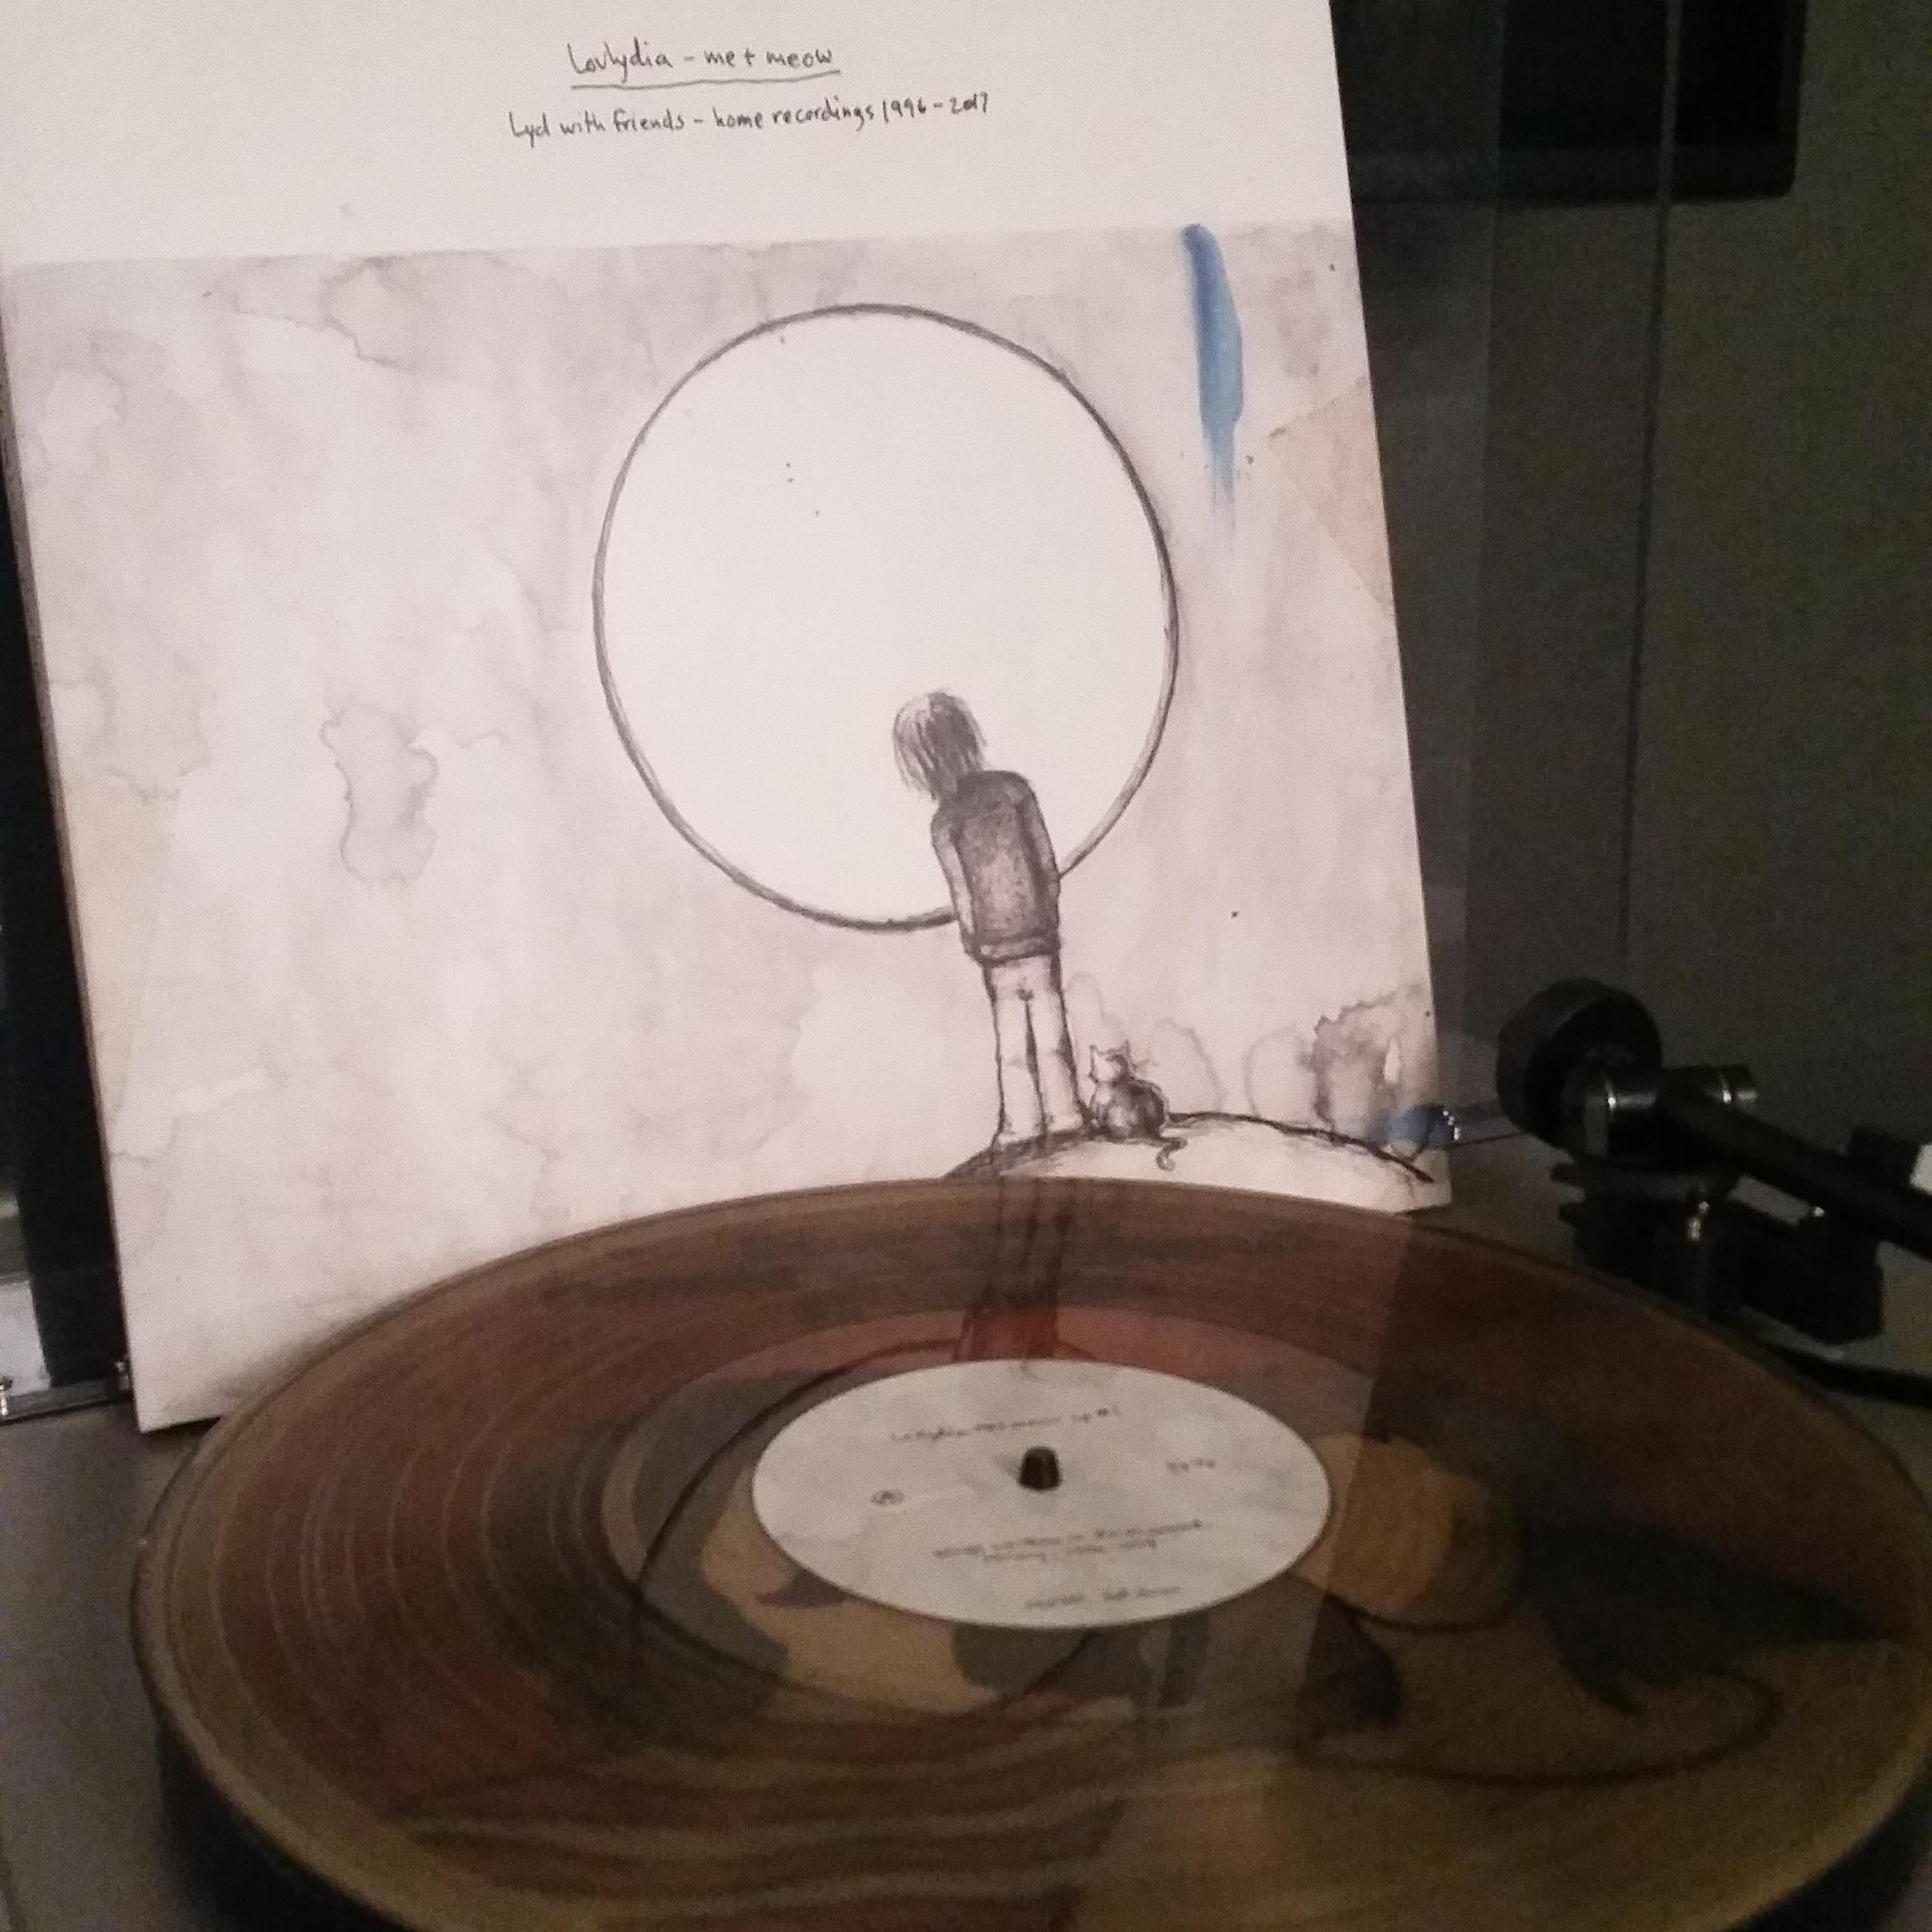 Topp Indierock Music Blog - 2012 Rockets - Lovlydia: Me + Meow triple LP BX-45